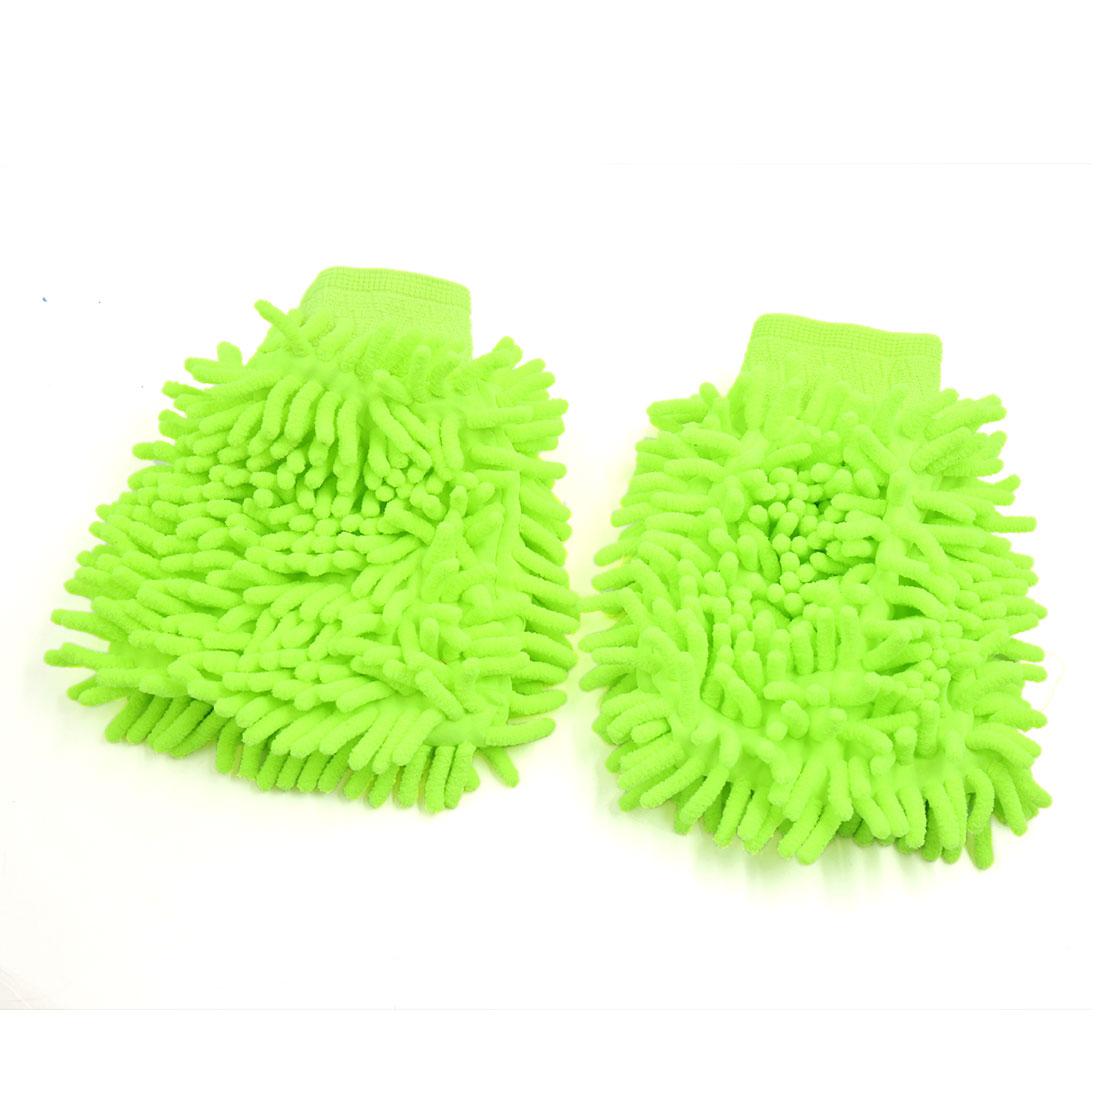 2Pcs Green Mircofiber Chenille Washing Glove Car Dusting Cleaning Tool Sleeve